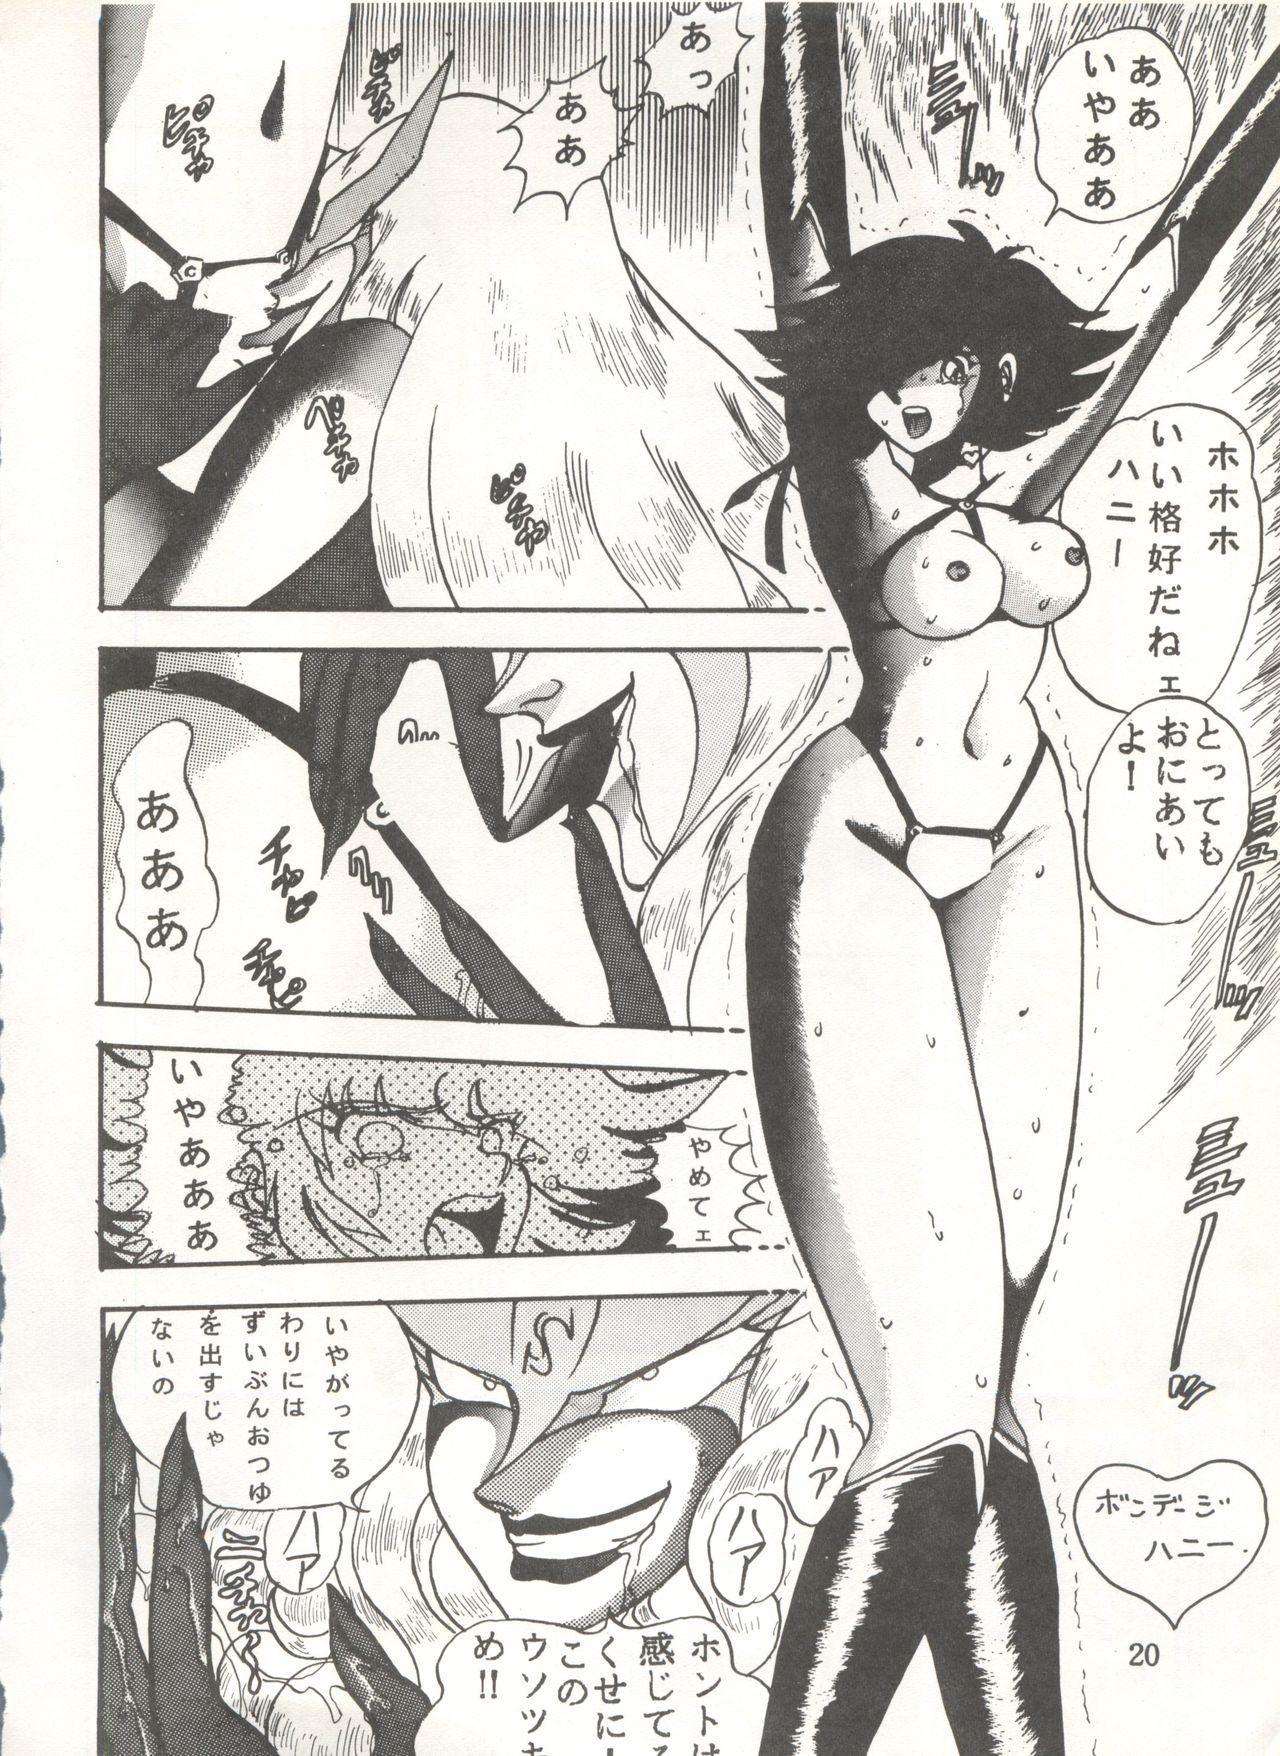 [Global One (MARO)] Sadistic 5 (Cutey Honey, Devilman, Sailor Moon), [Global One (MARO)] Sadistic (Dirty Pair, Fushigi no Umi no Nadia, Sailor Moon), [Studio Ikkatsumajin] .ribbon (Hime-chan's Ribbon) 19